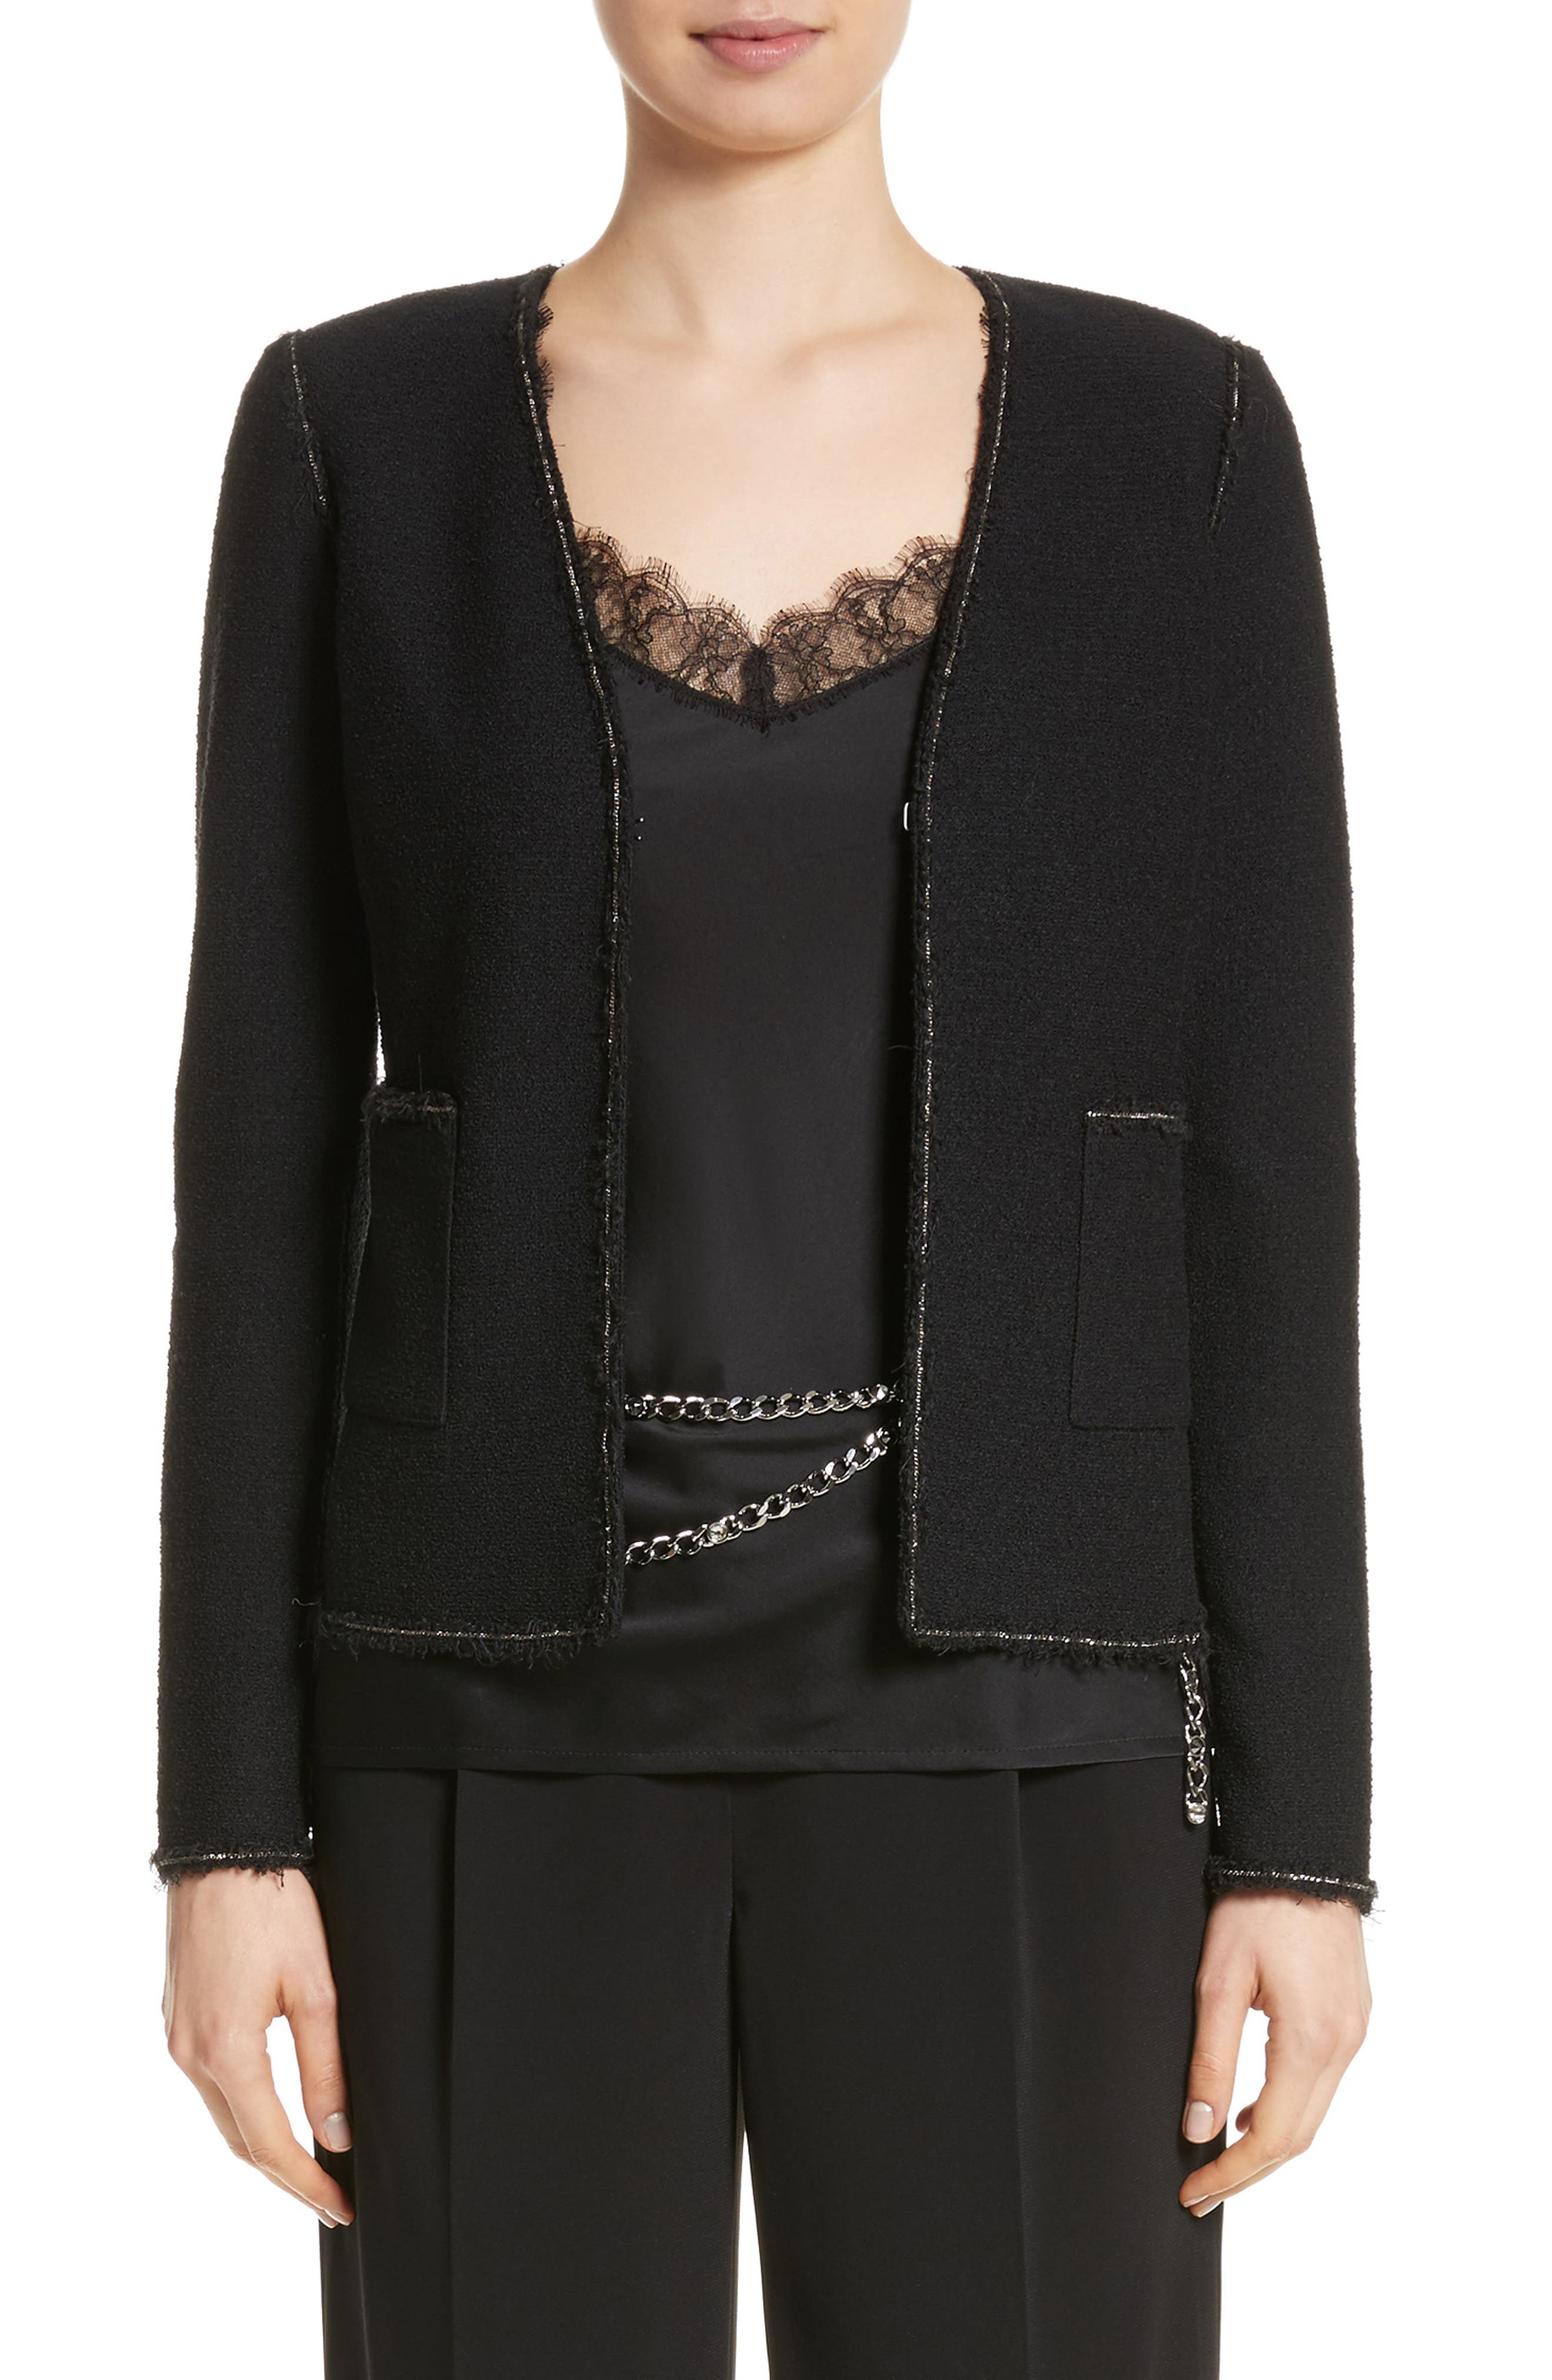 Bouclé Knit Jacket,                             Main thumbnail 1, color,                             CAVIAR